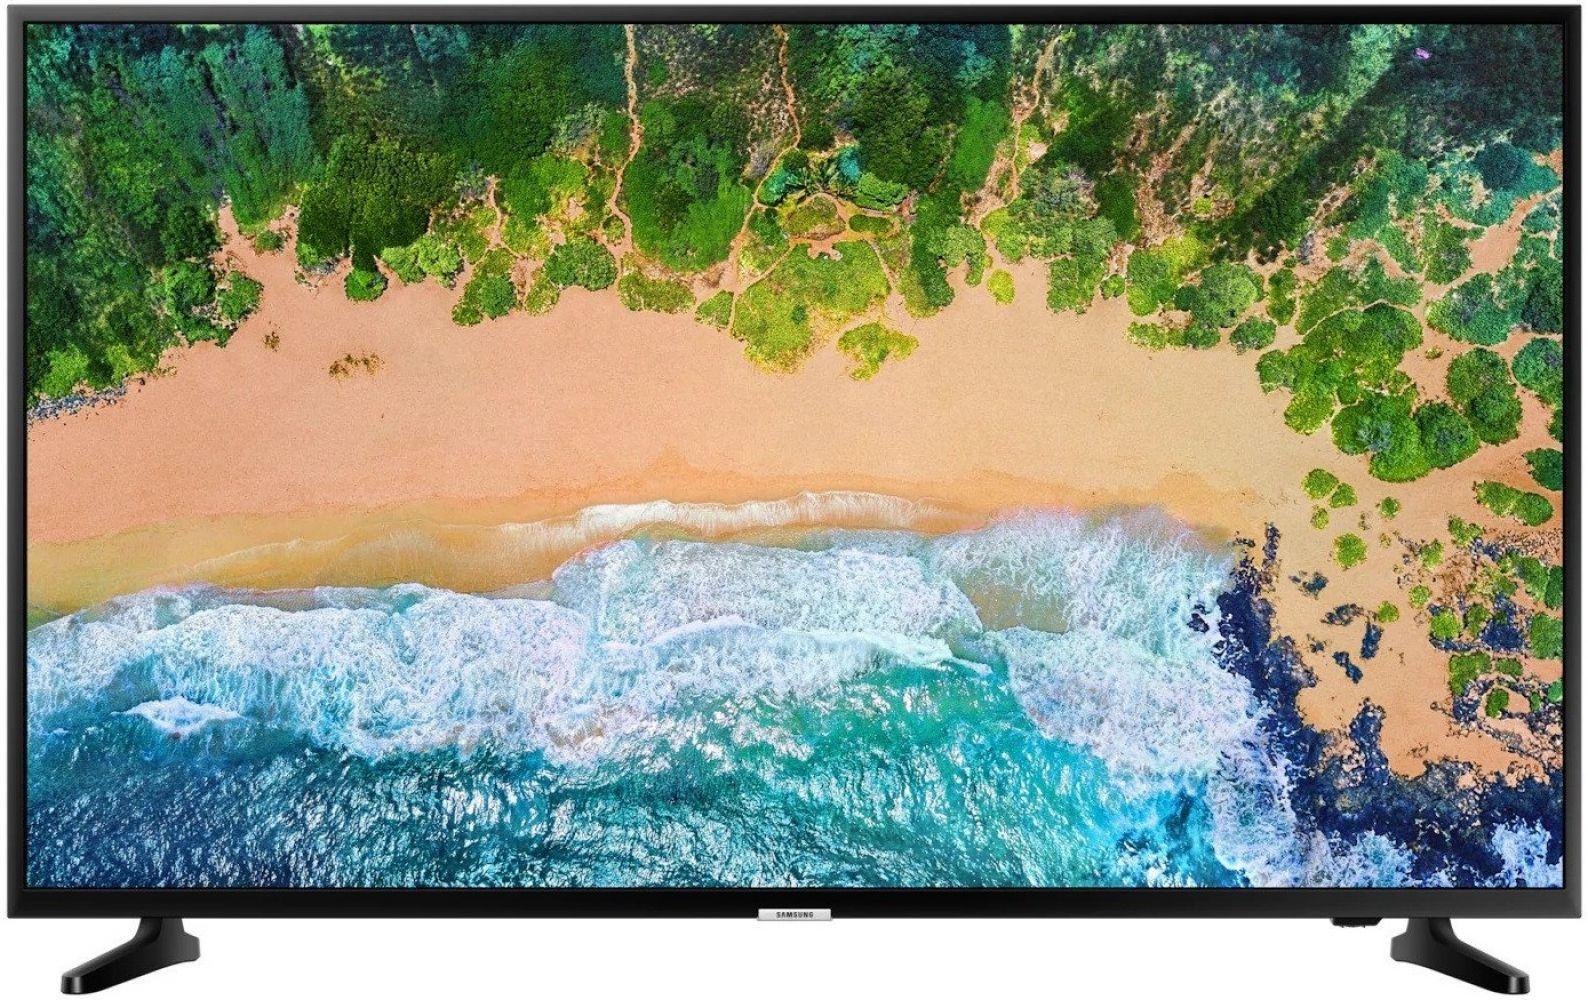 Купить Телевизоры, Телевизор SAMSUNG UE50NU7090UXUA